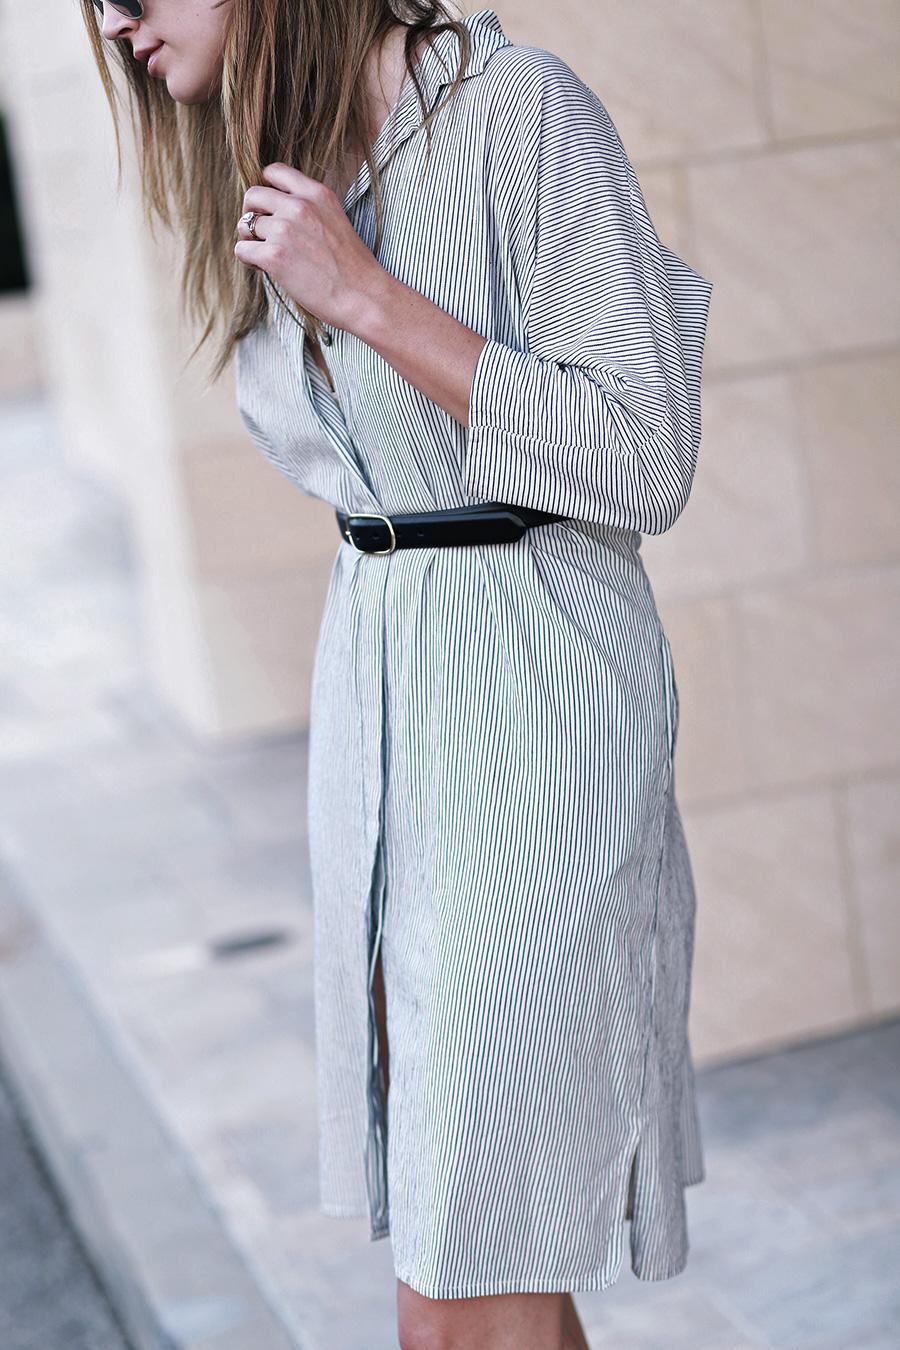 chloe sandals ganni dress 5